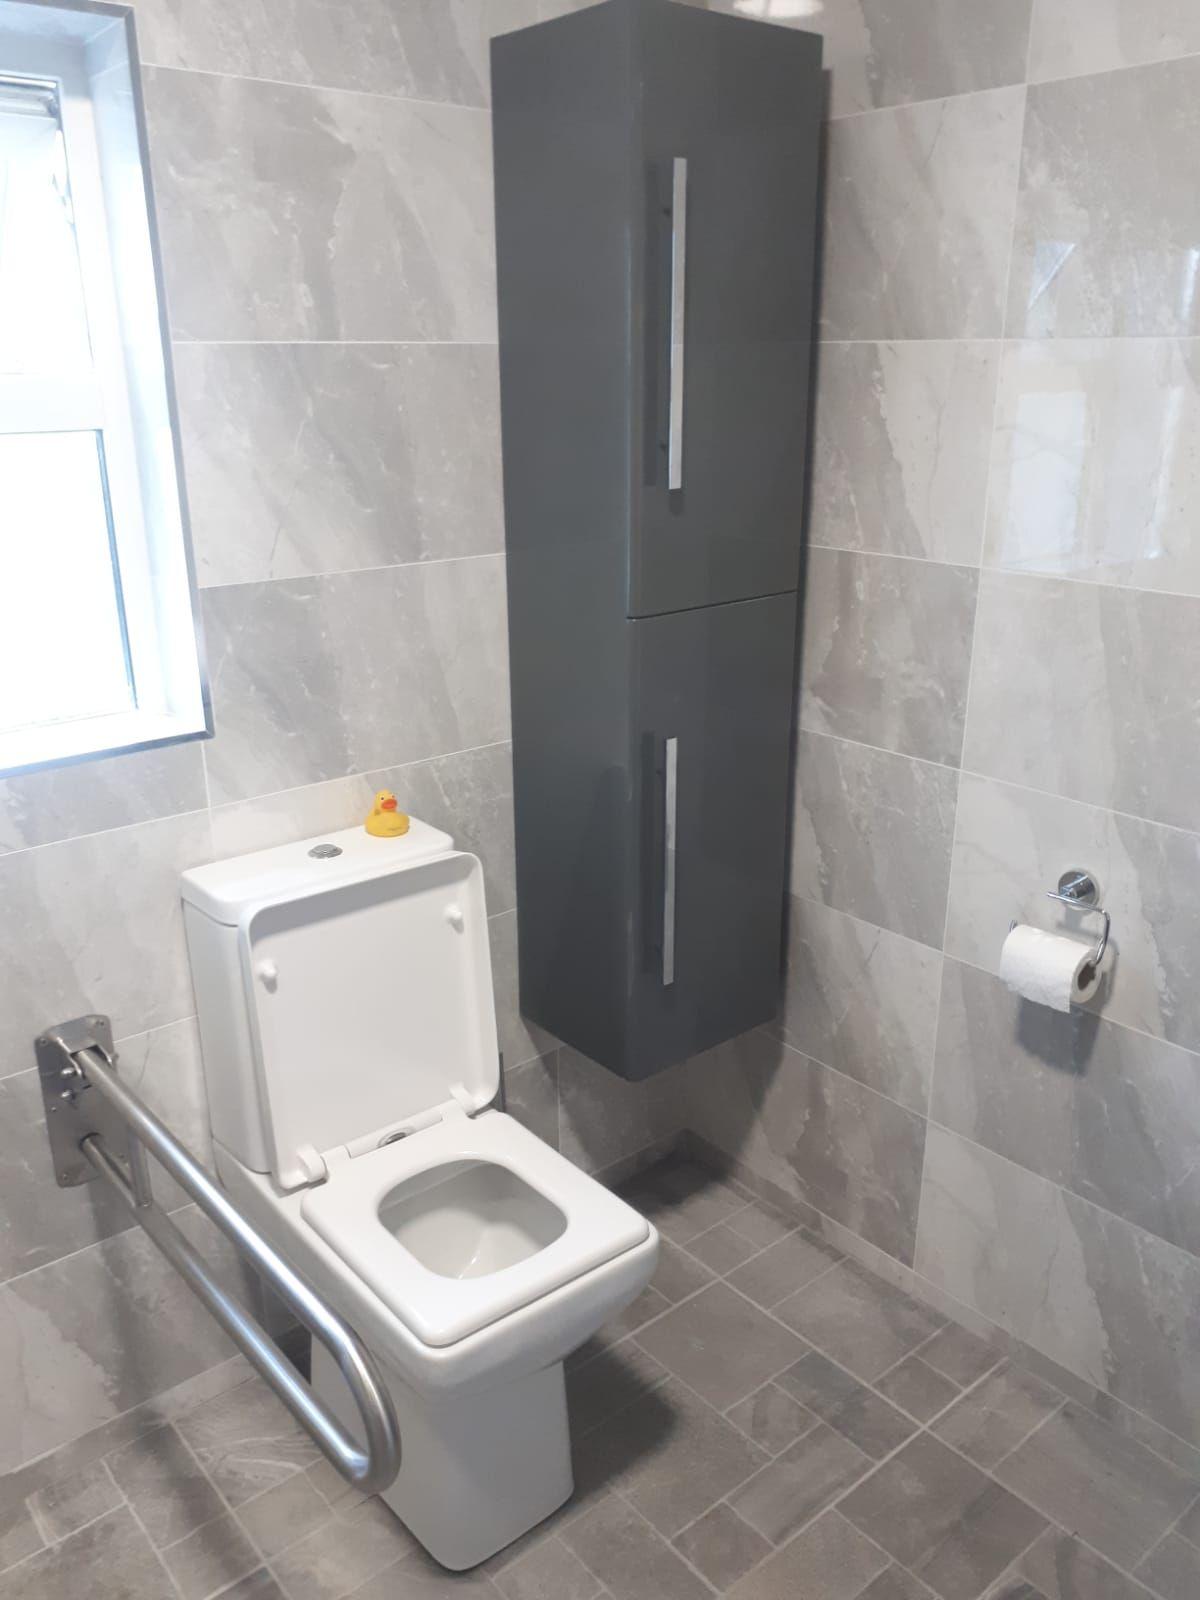 Pin by Rafael Cumbe on Big Rafa   Bathroom renovations ...